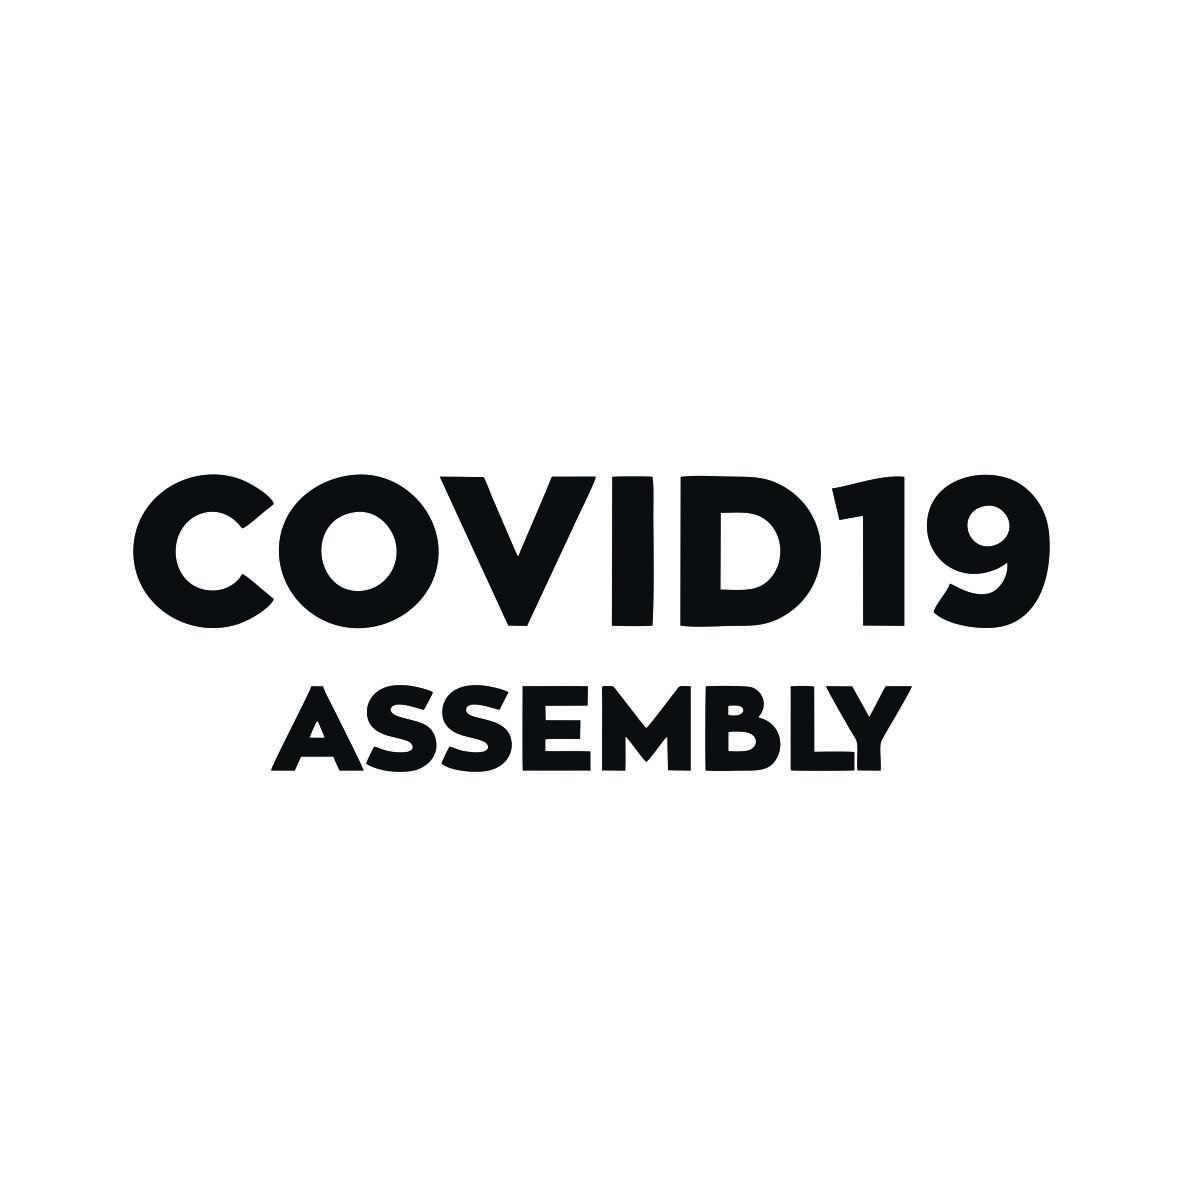 Covid19 Assembly